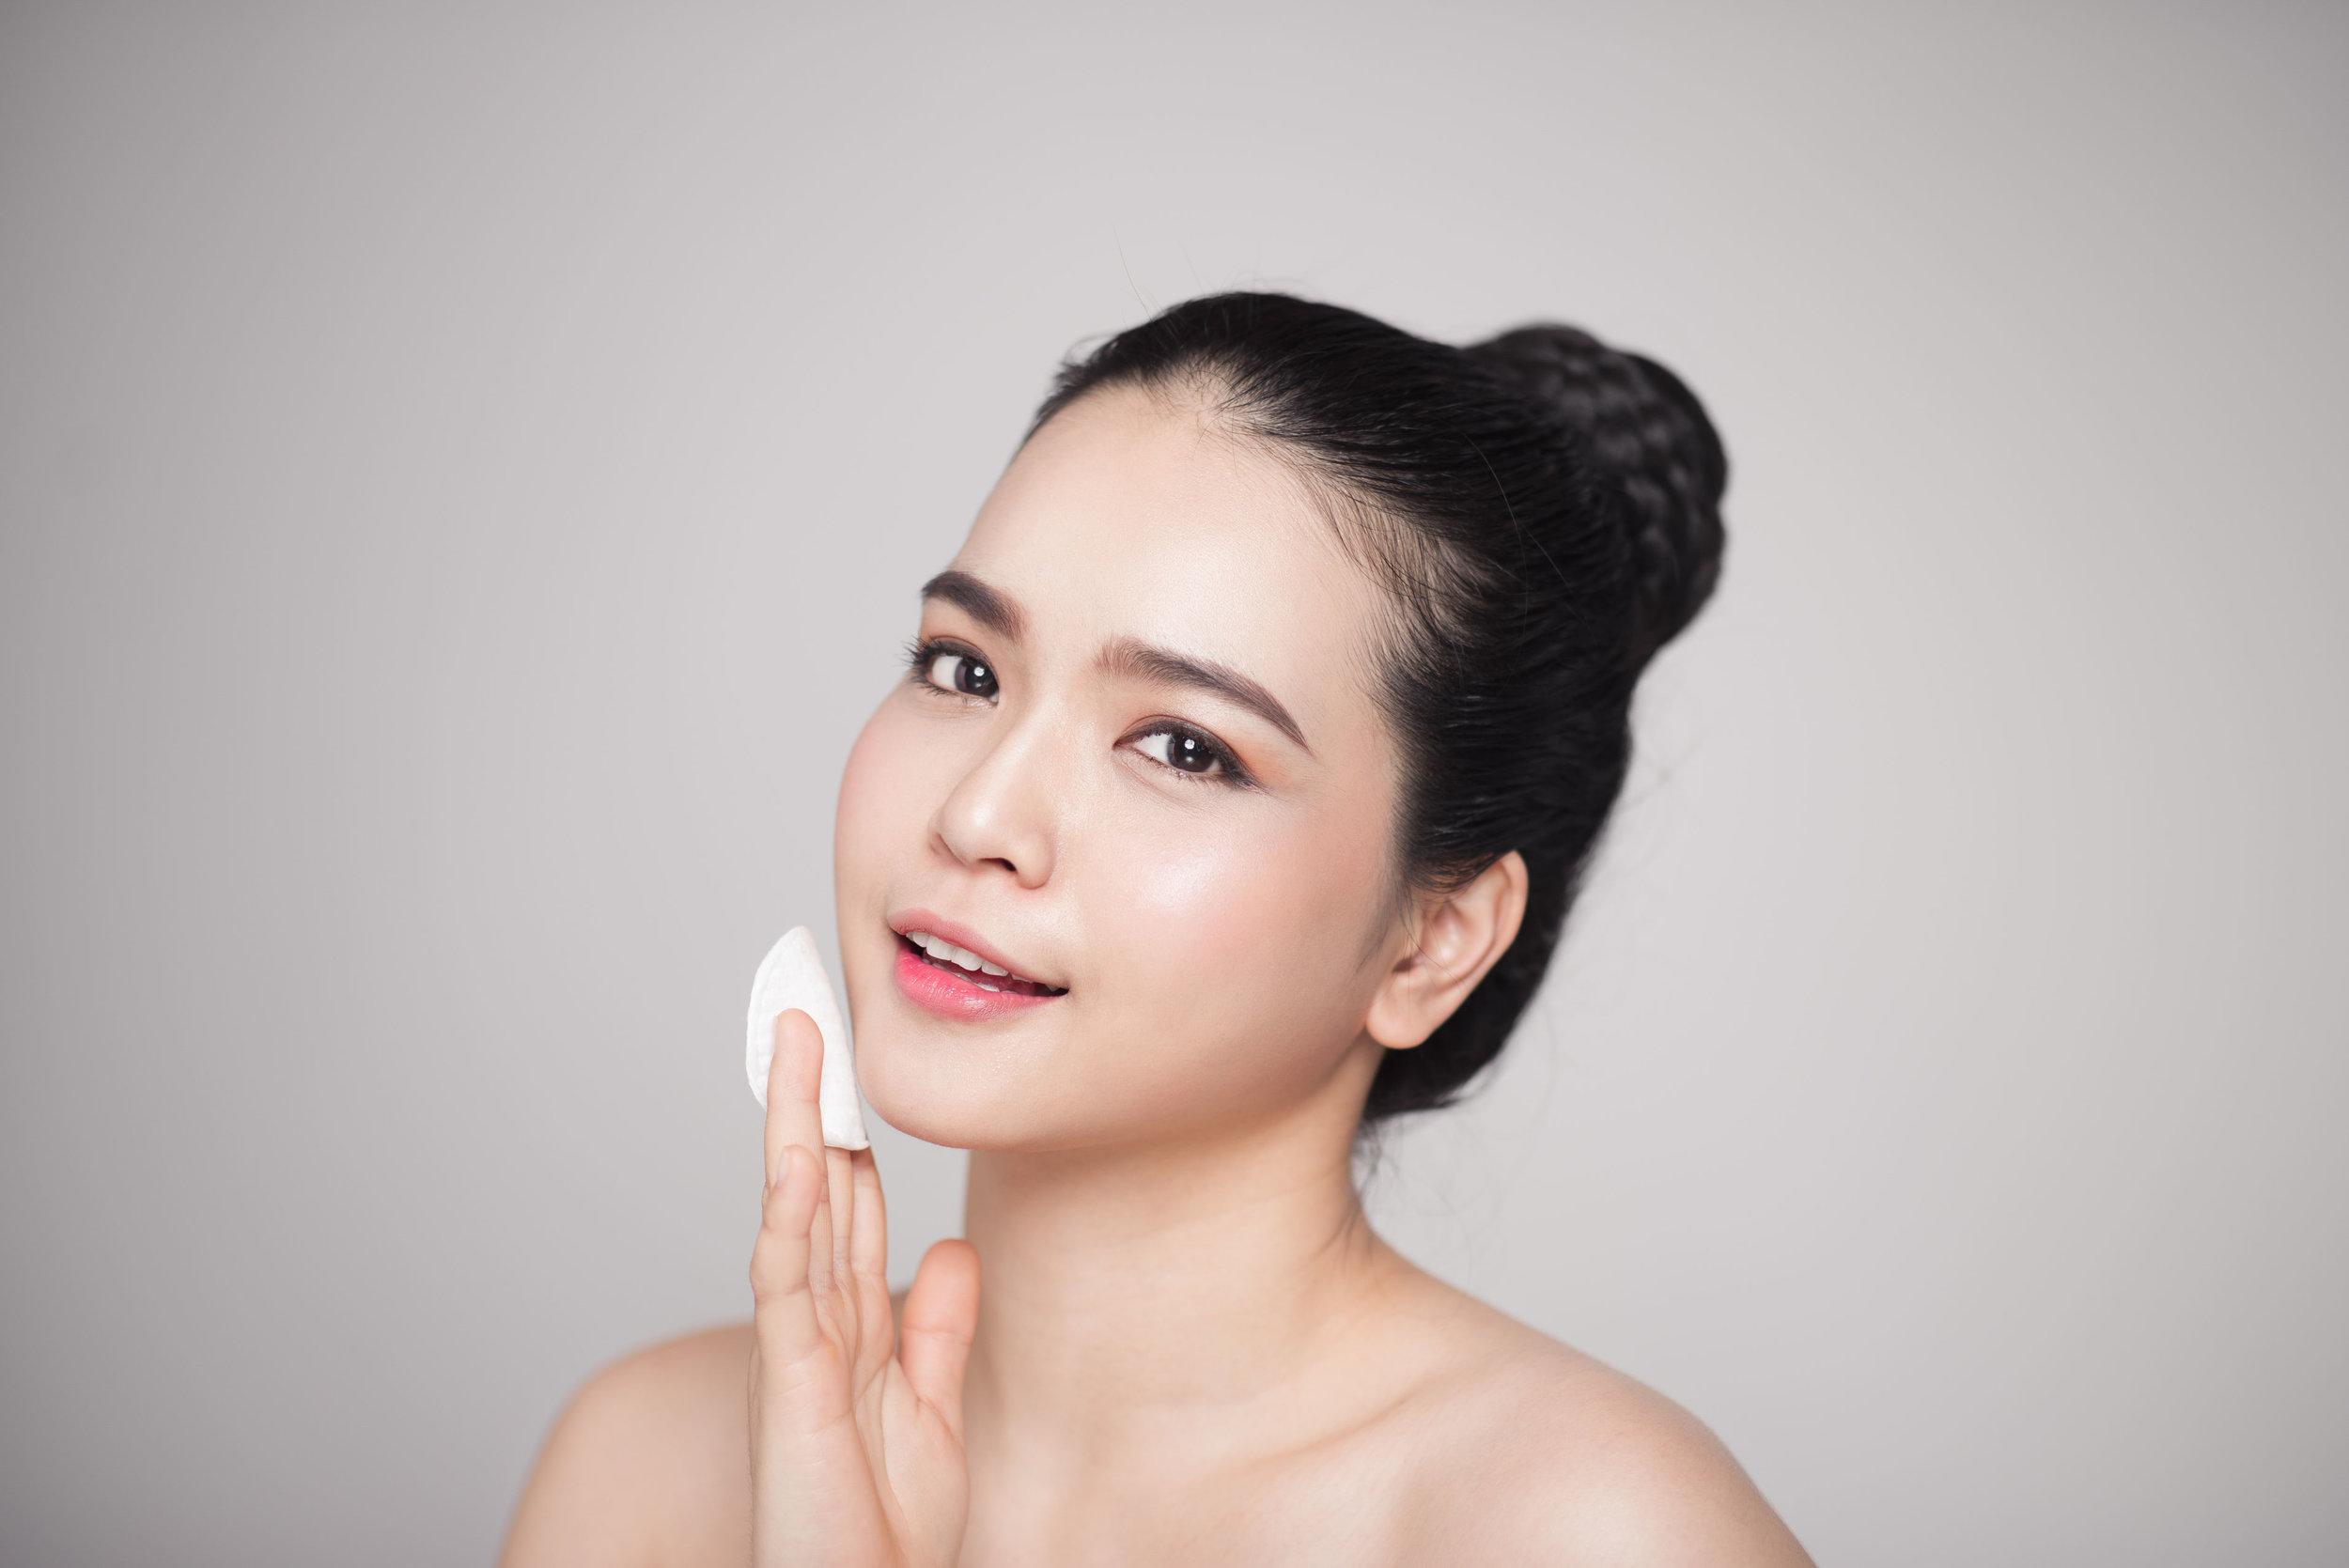 Skin toner